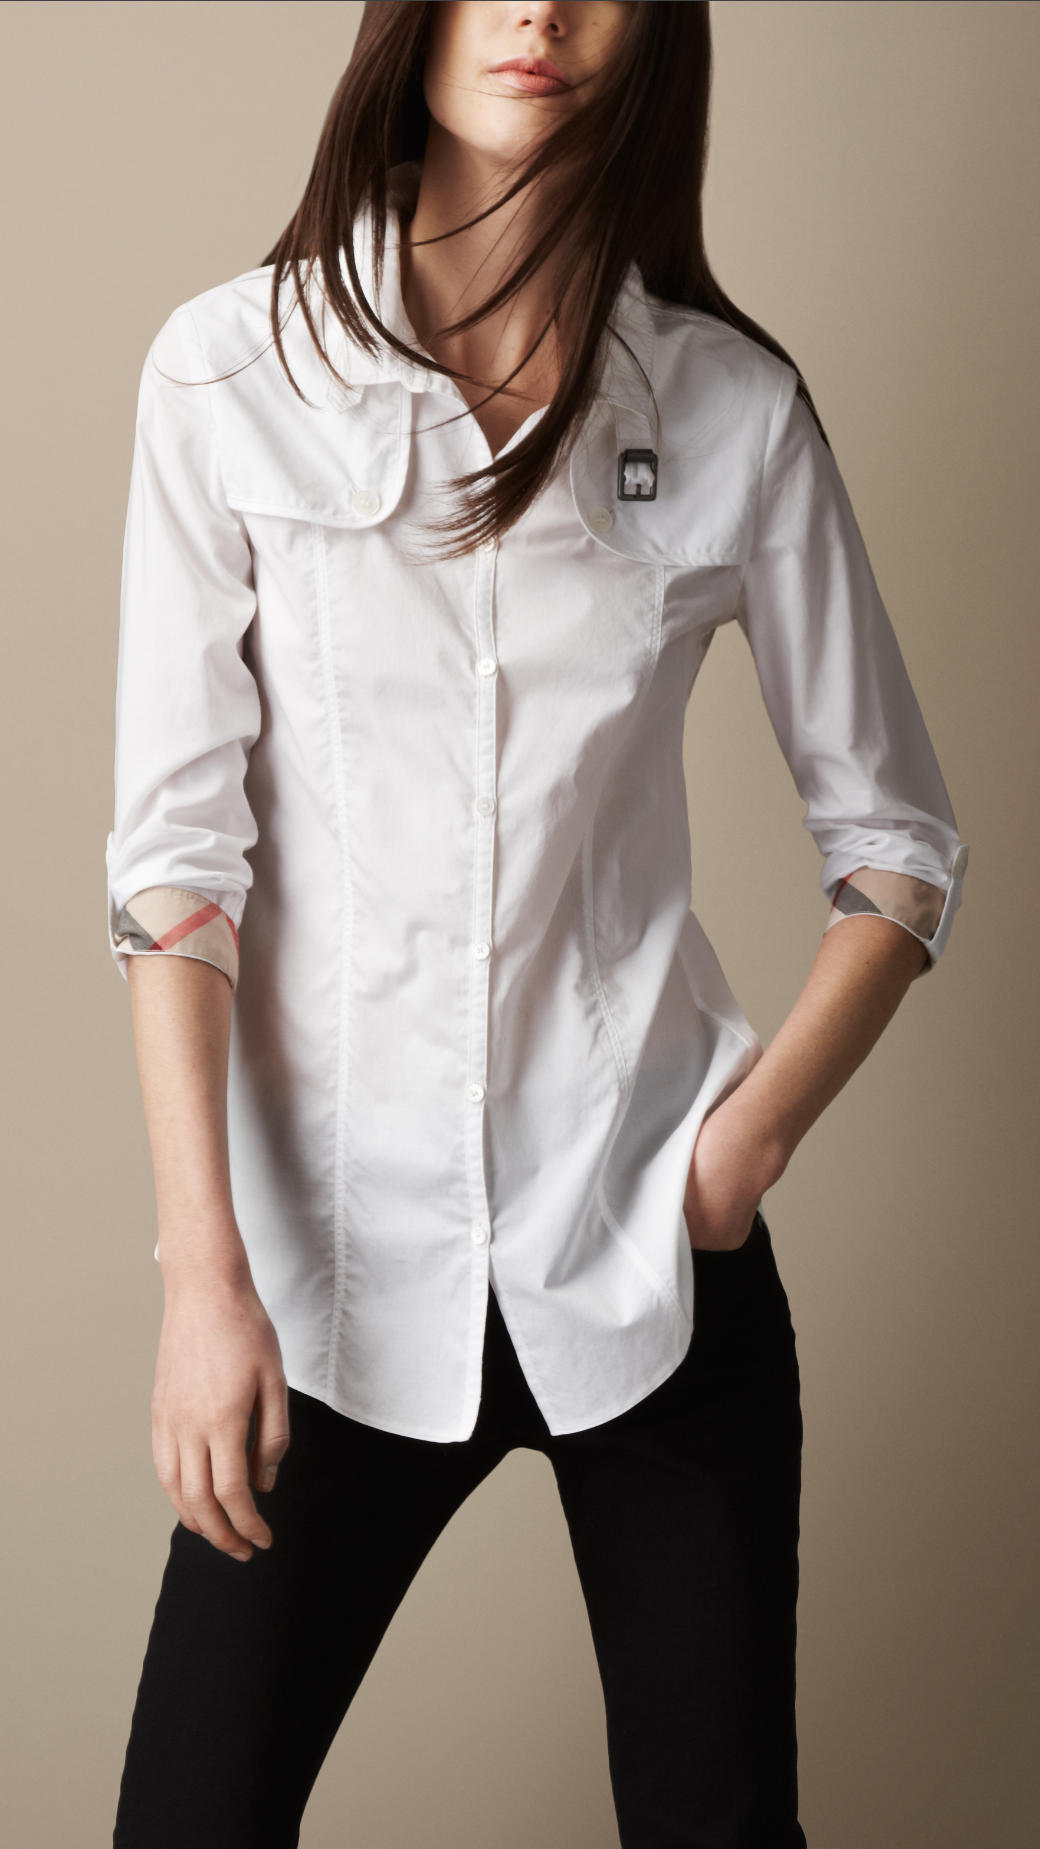 Lyst - Burberry Brit Heritage Cotton Poplin Shirt in White ba2977ee7d